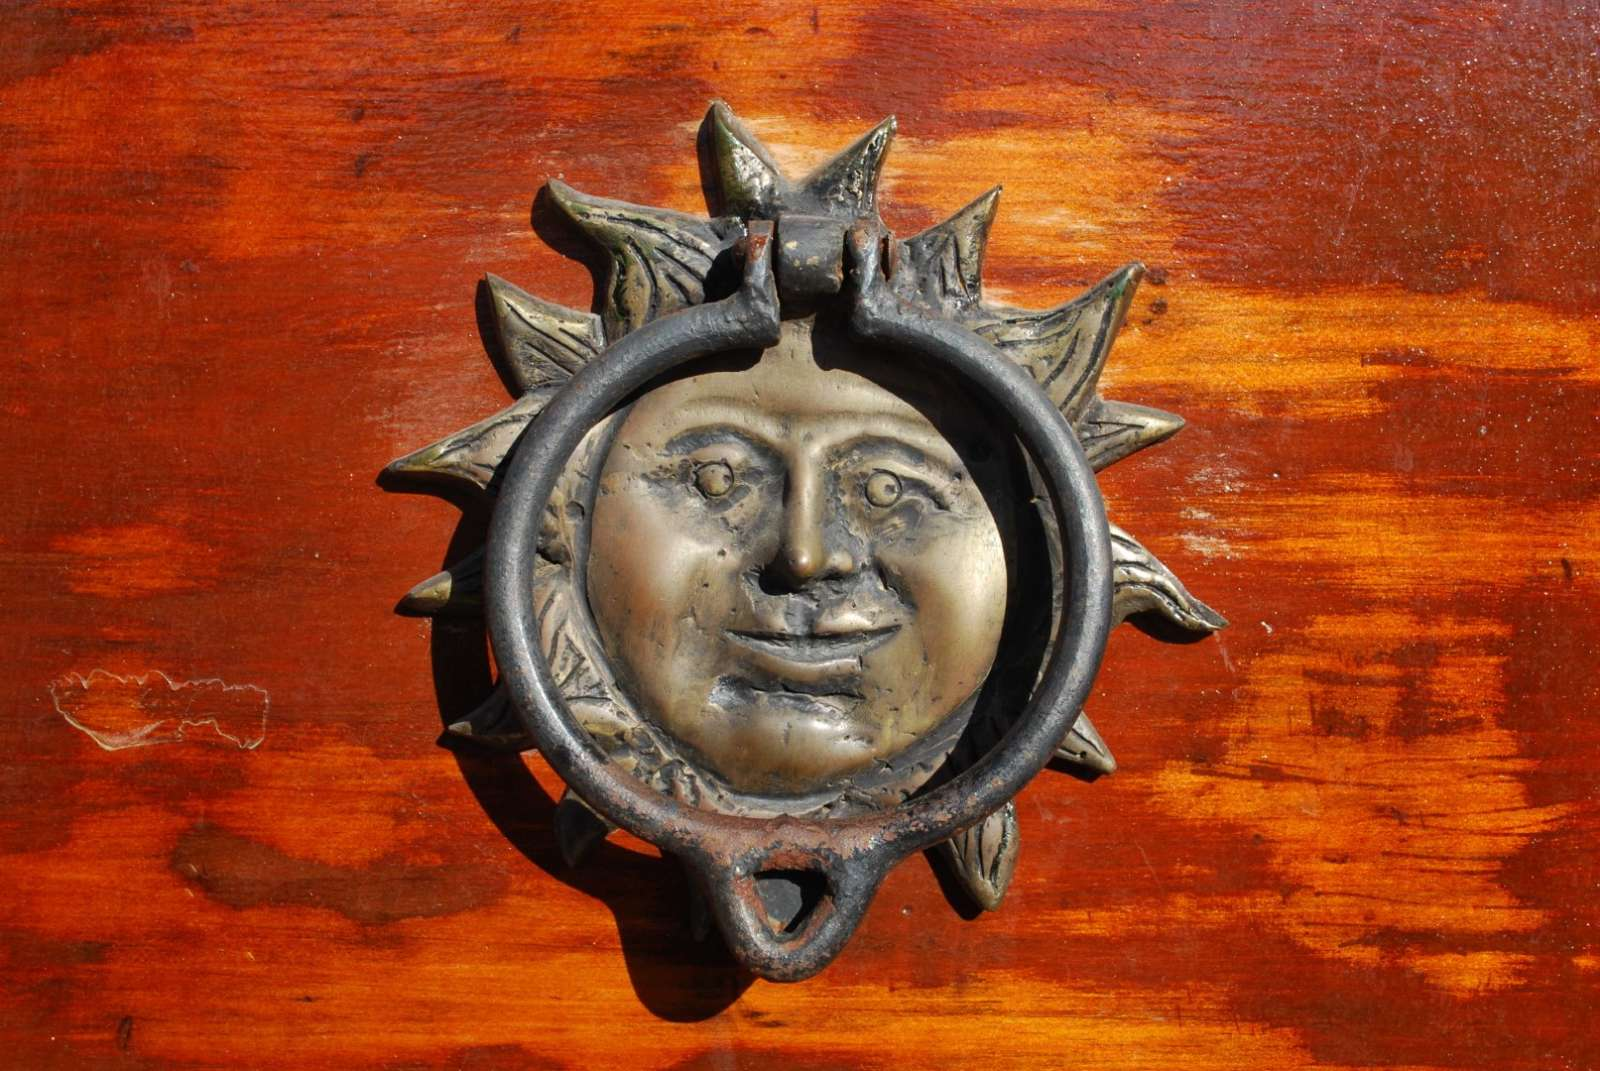 Door knob in Antigua, Guatemala